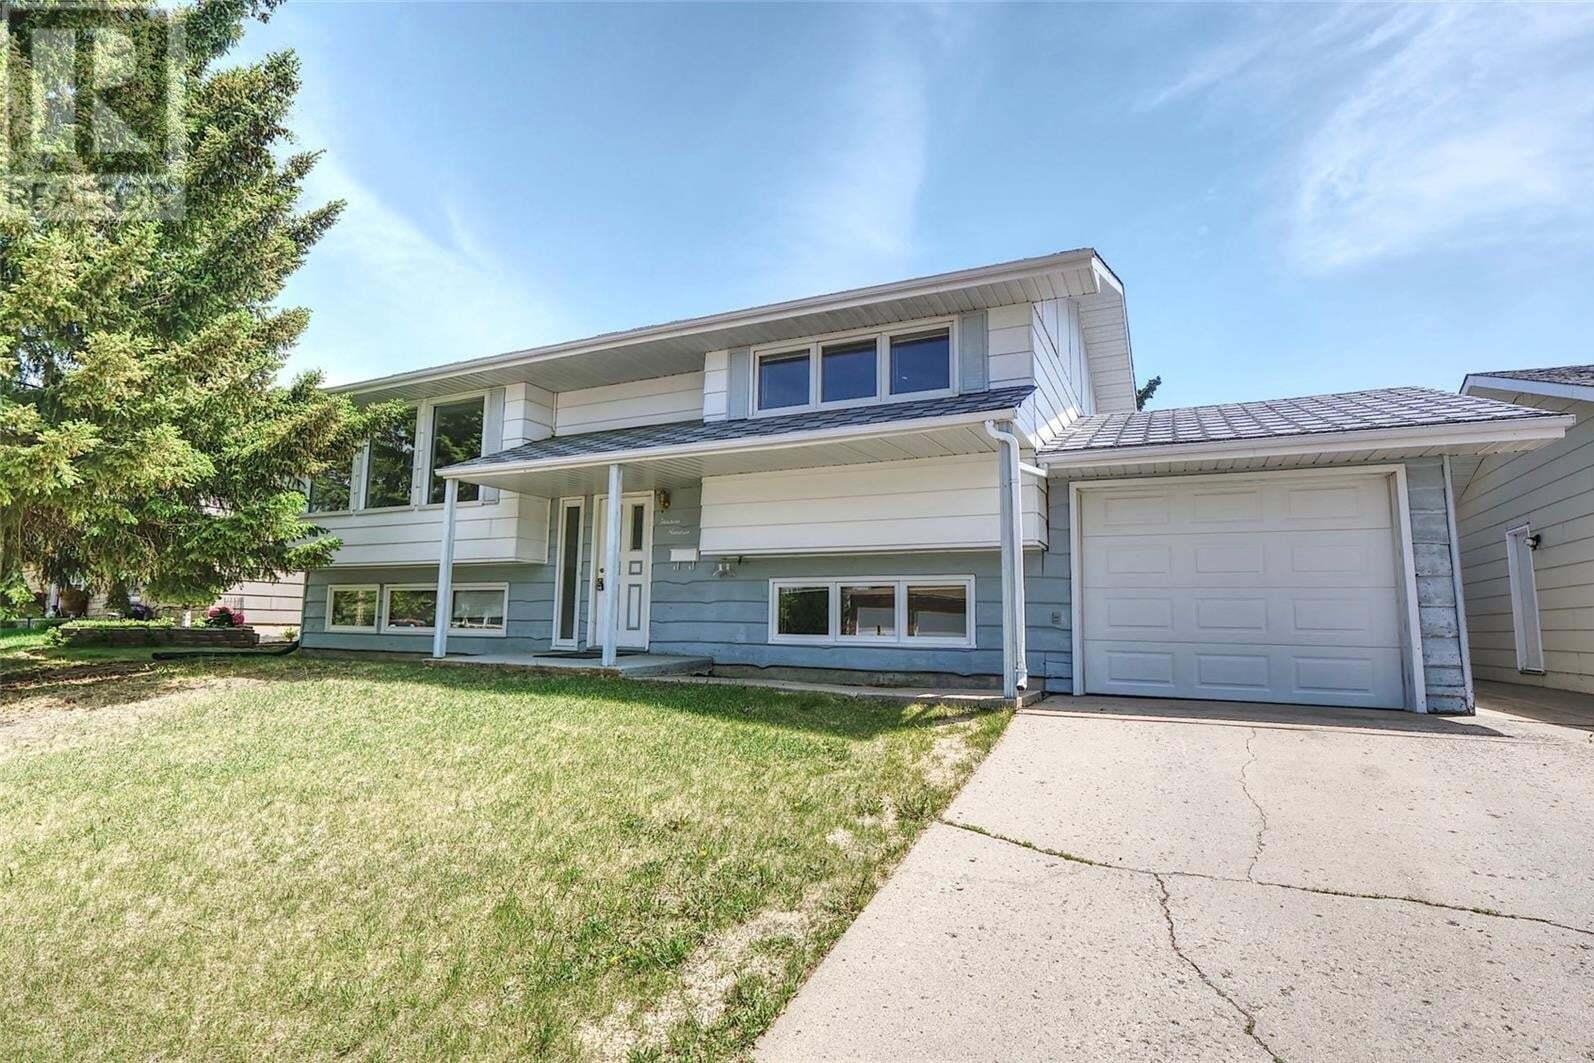 House for sale at 1319 Princess Cres Moose Jaw Saskatchewan - MLS: SK810210